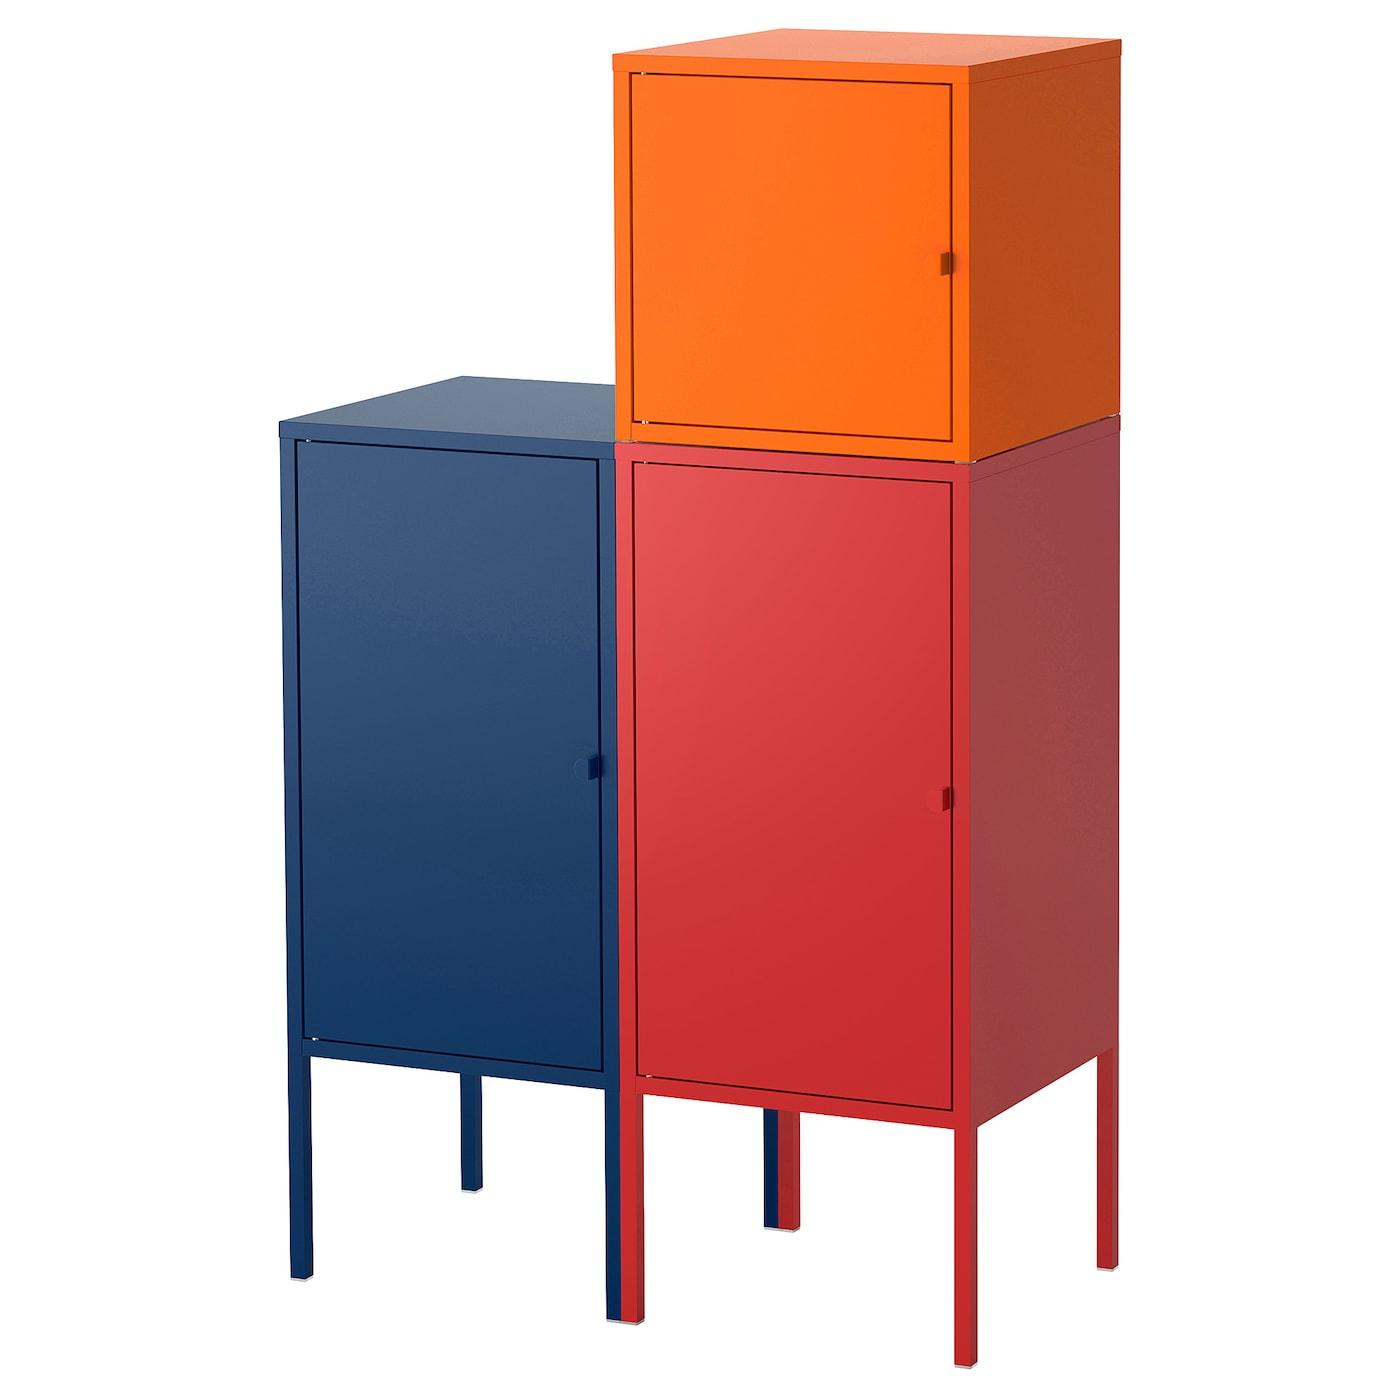 LIXHULT, Aufbewahrungskombi, dunkelblau, rot/orange 892.486.82